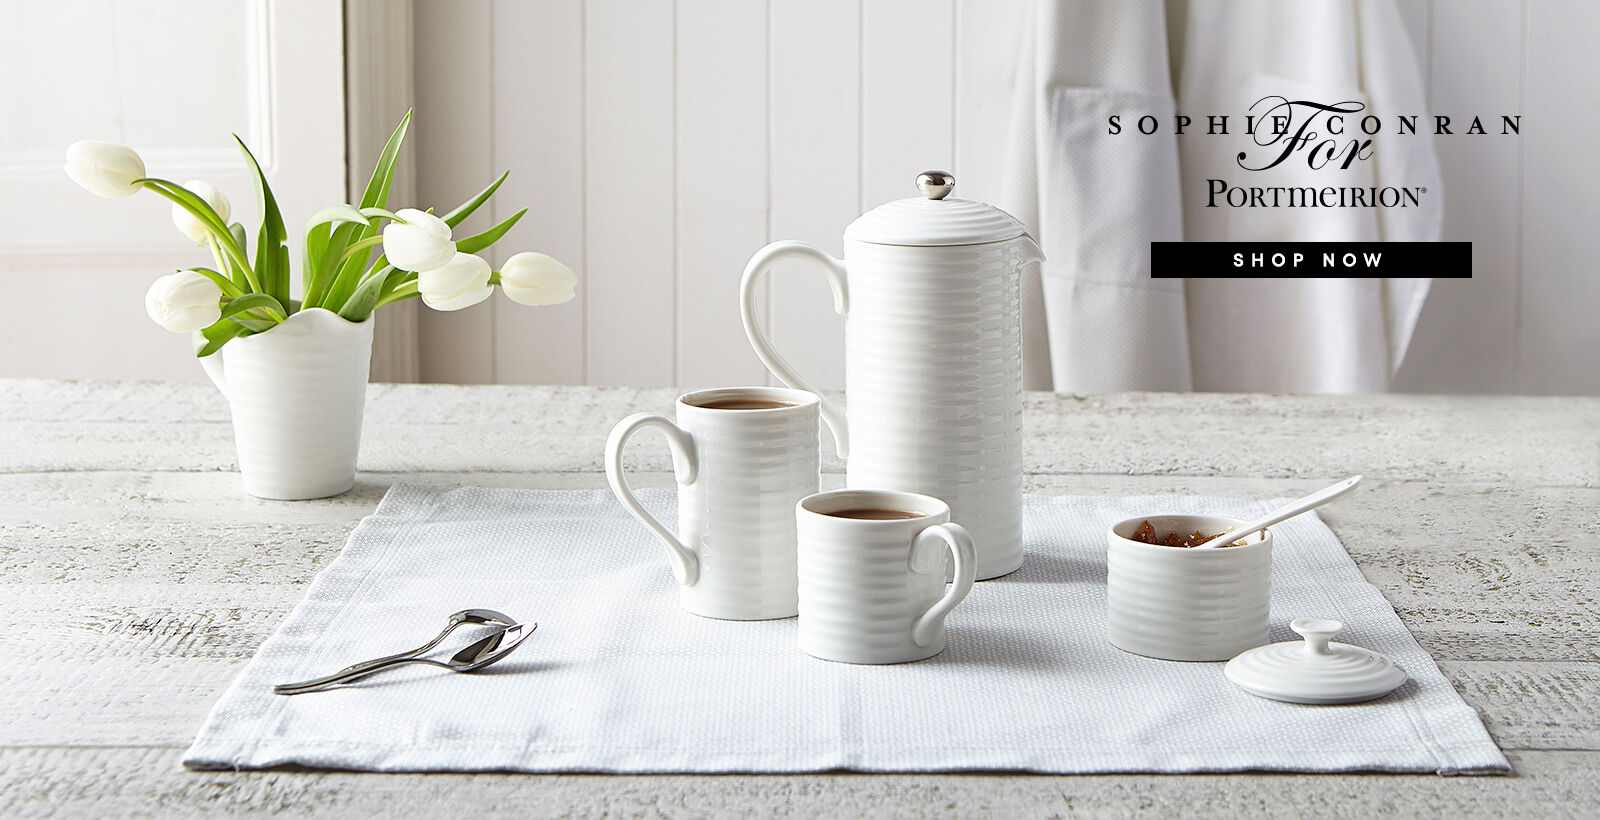 Sophie Conran for Portmeirion Collection